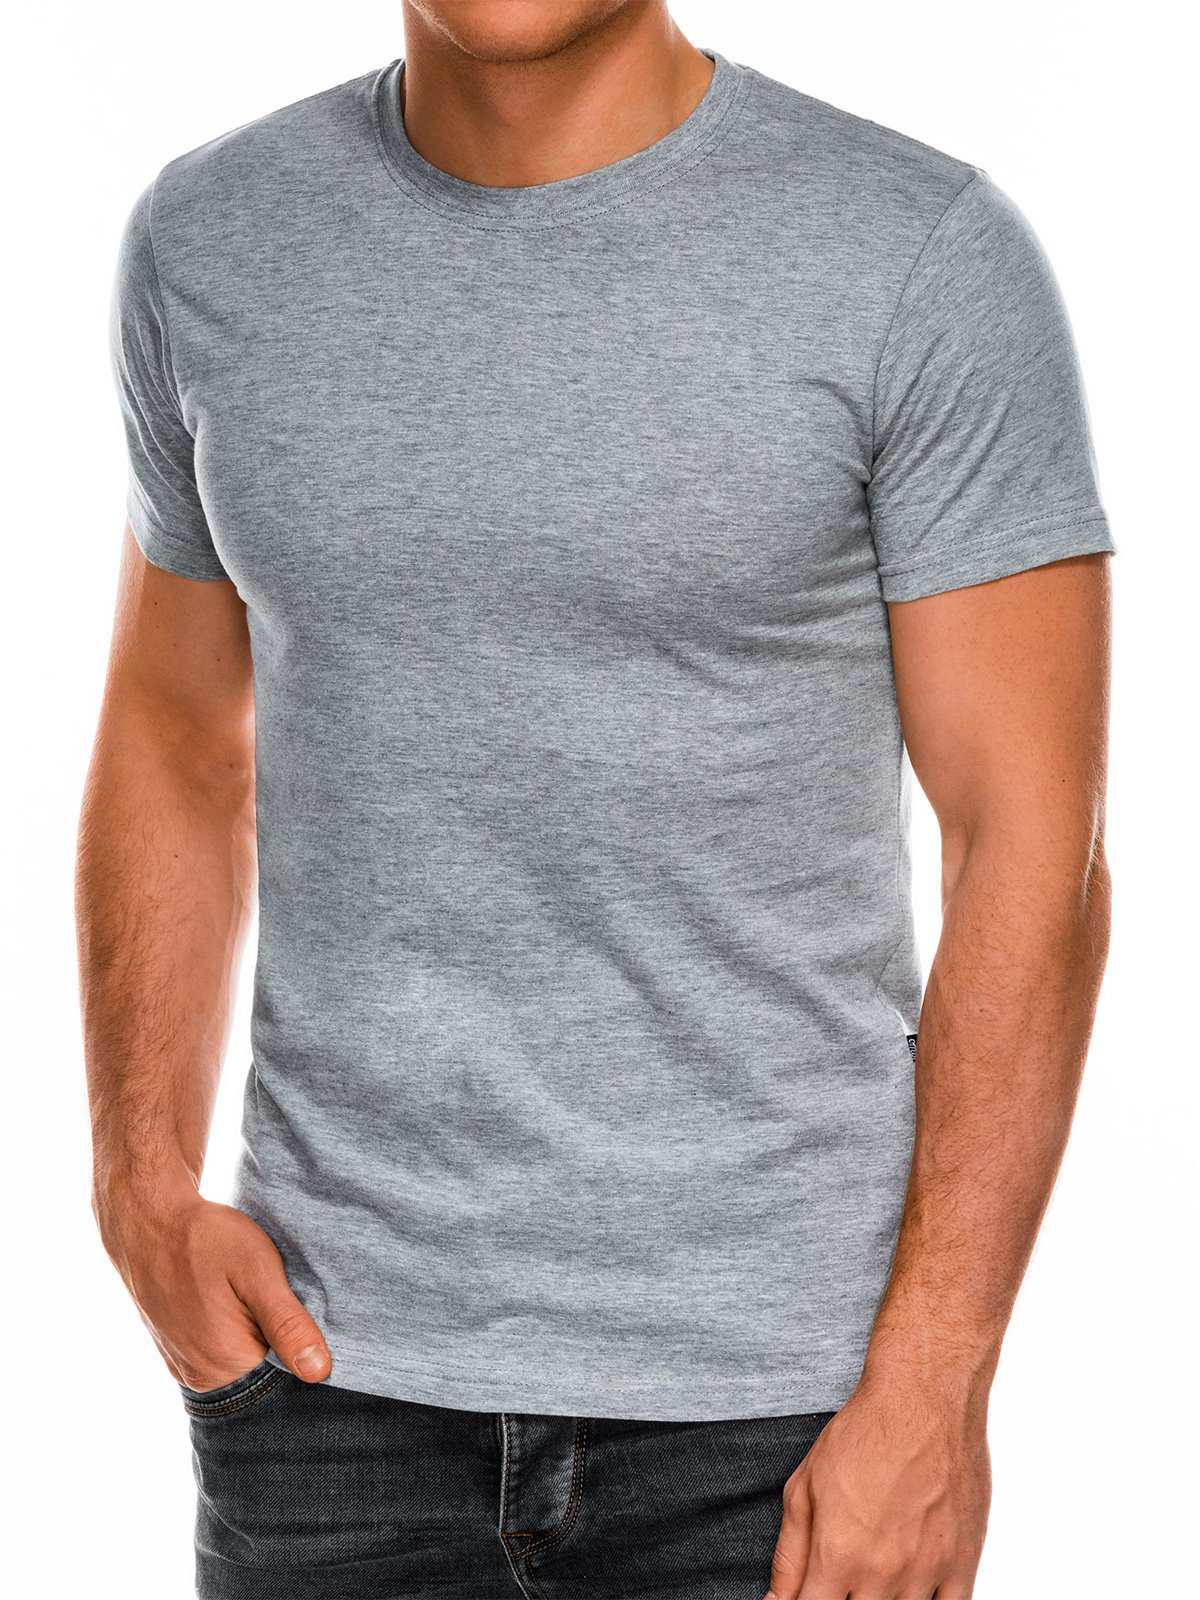 T-shirt męski beznadruku S884 - szary